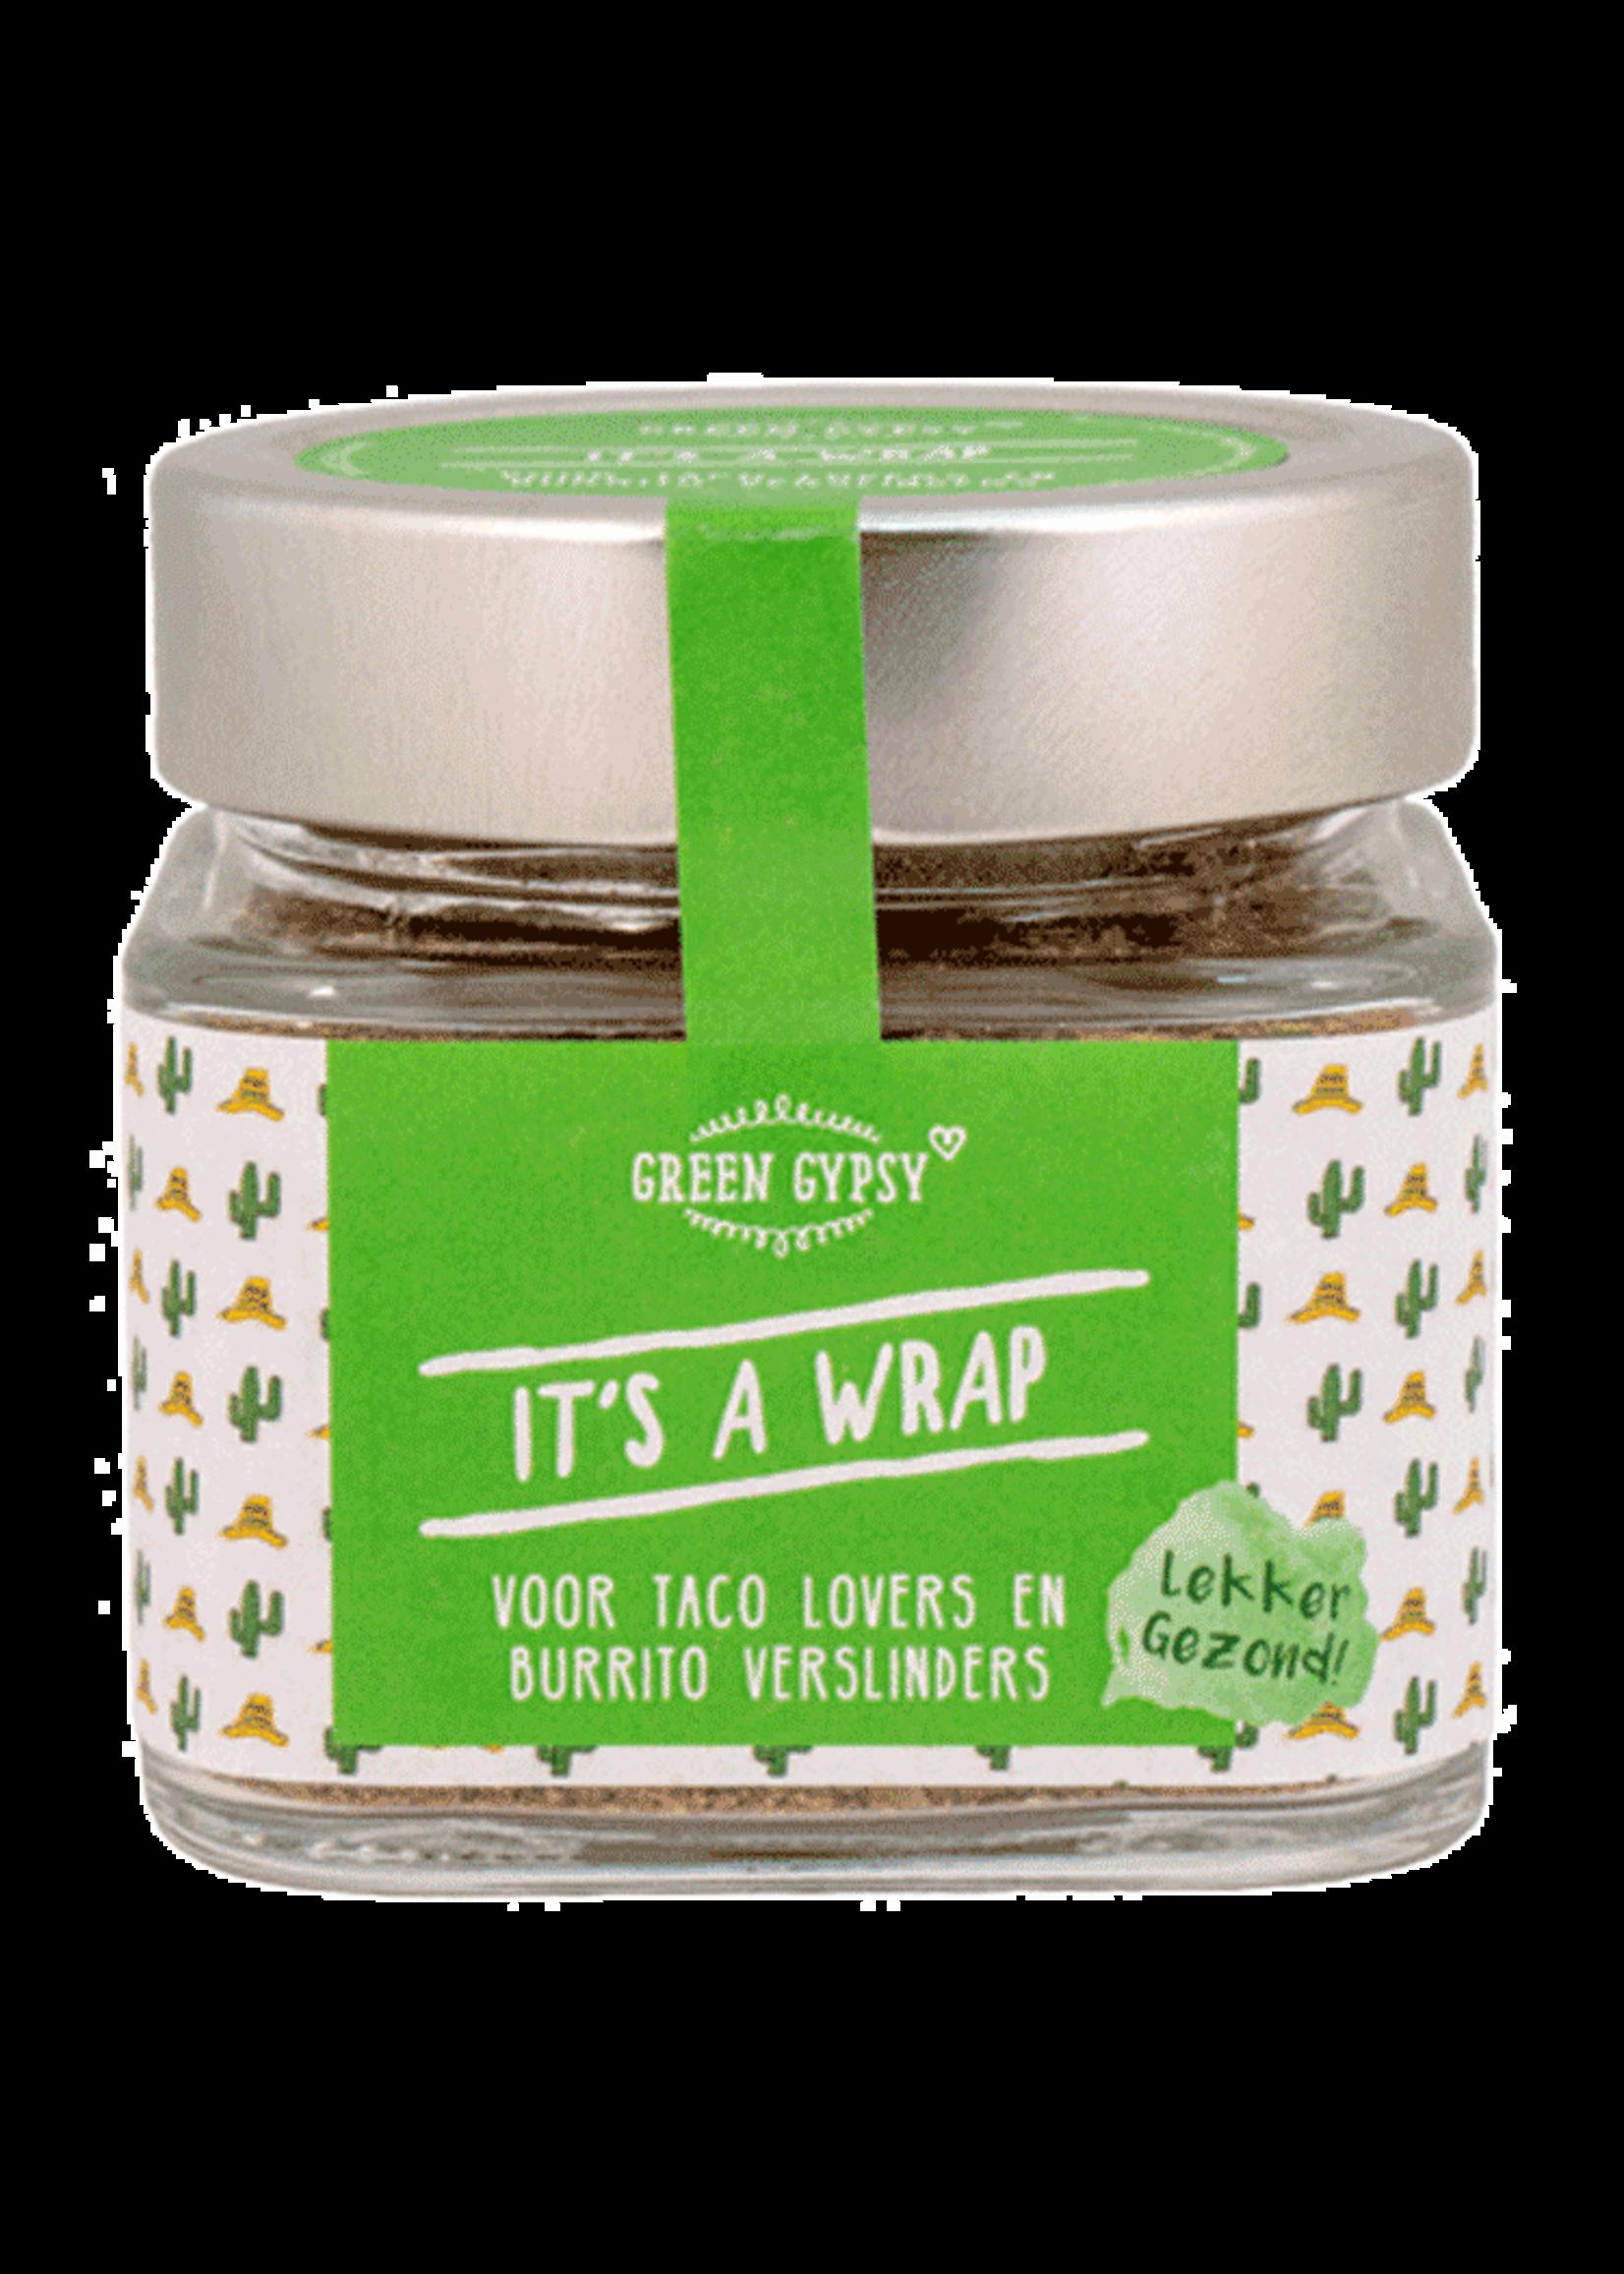 Green Gypsy Spices Kruidenmix It's A Wrap Green Gypsy